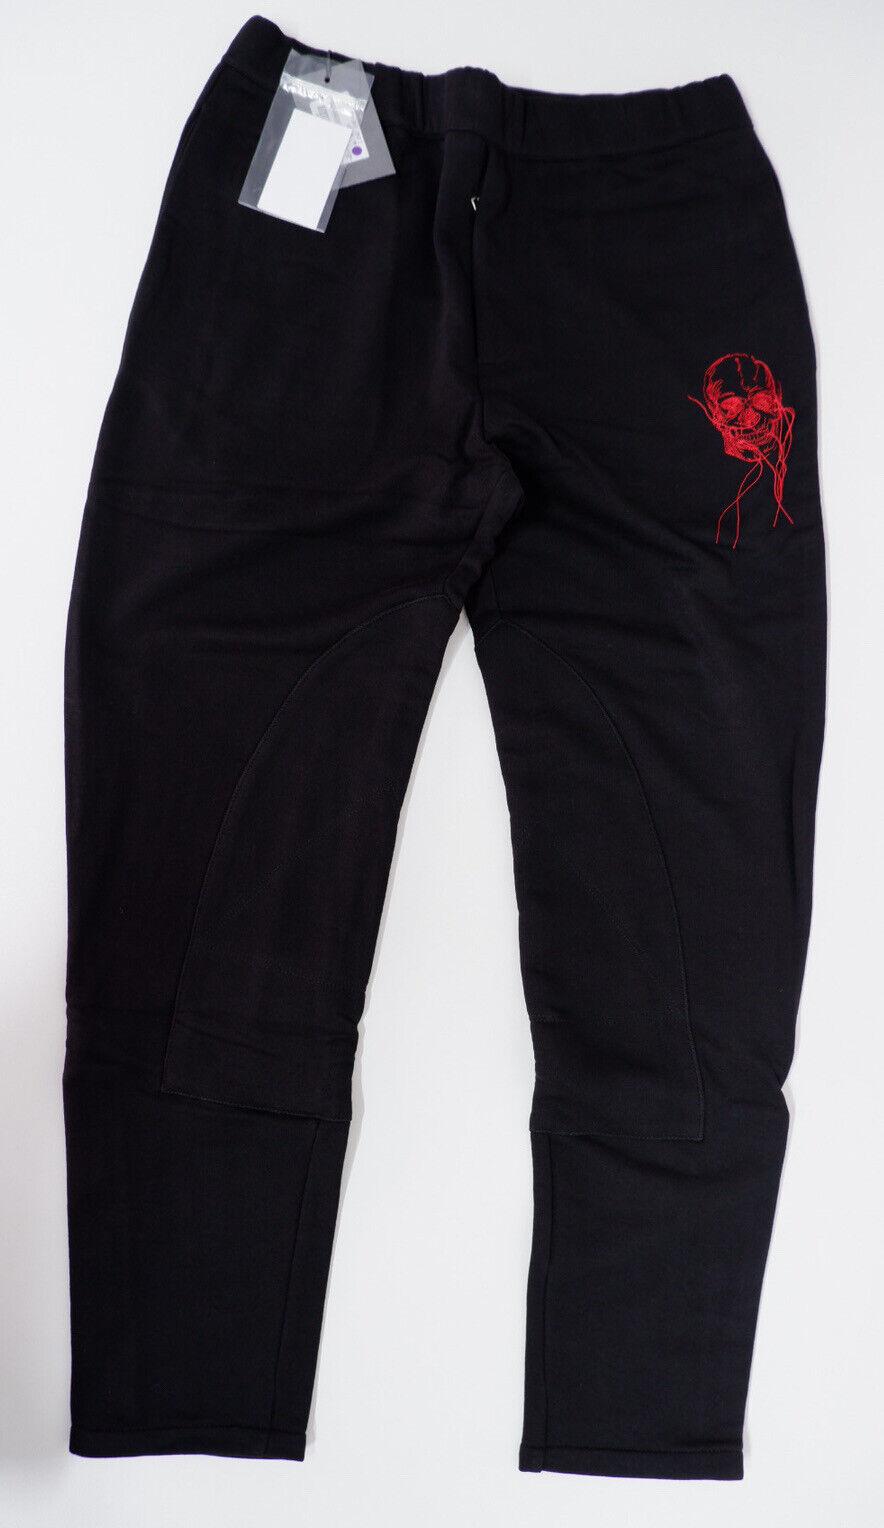 Alexander McQueen Mens Thread Skull Tracksuit Bottoms, Pants, XL, NEW